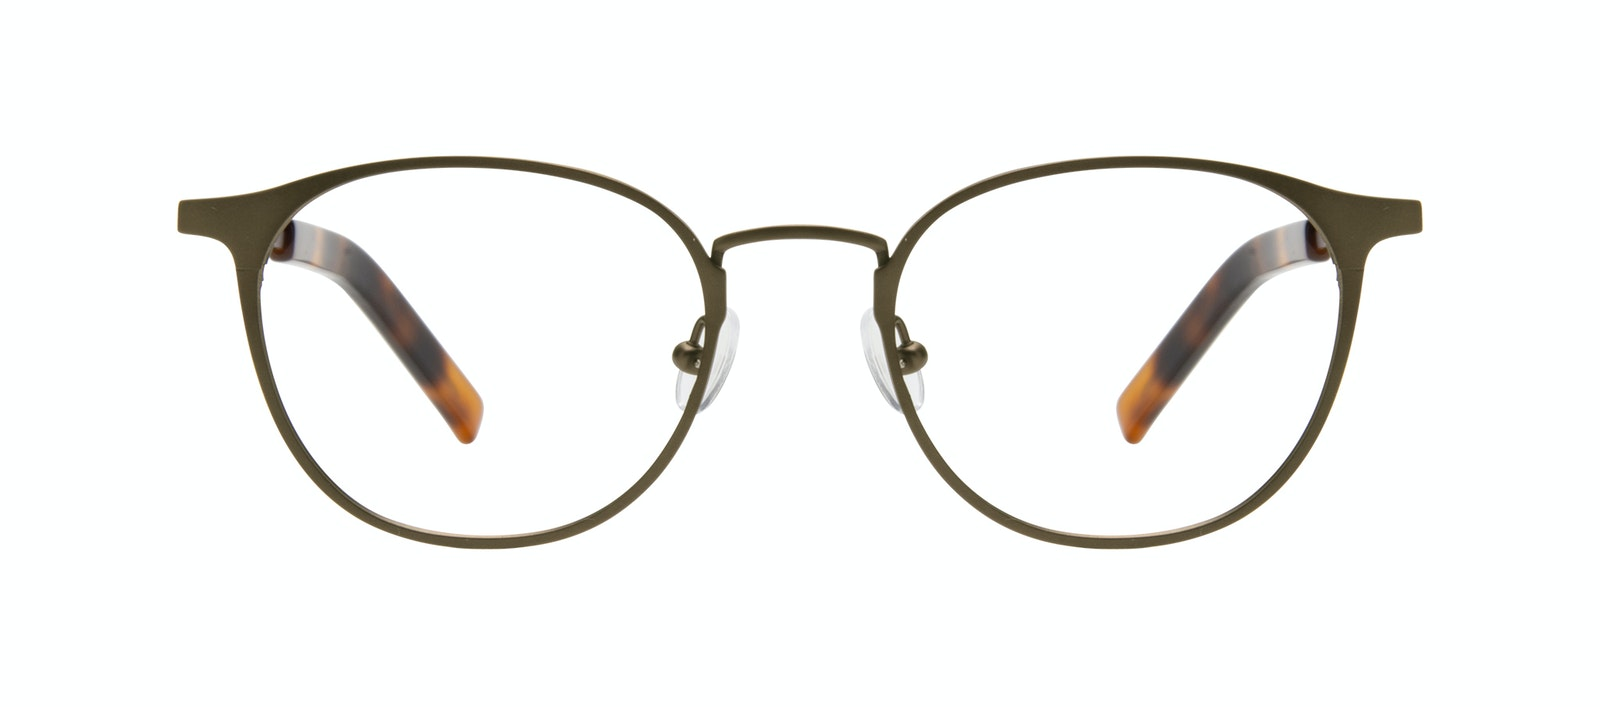 Affordable Fashion Glasses Round Eyeglasses Men Point Khaki Front